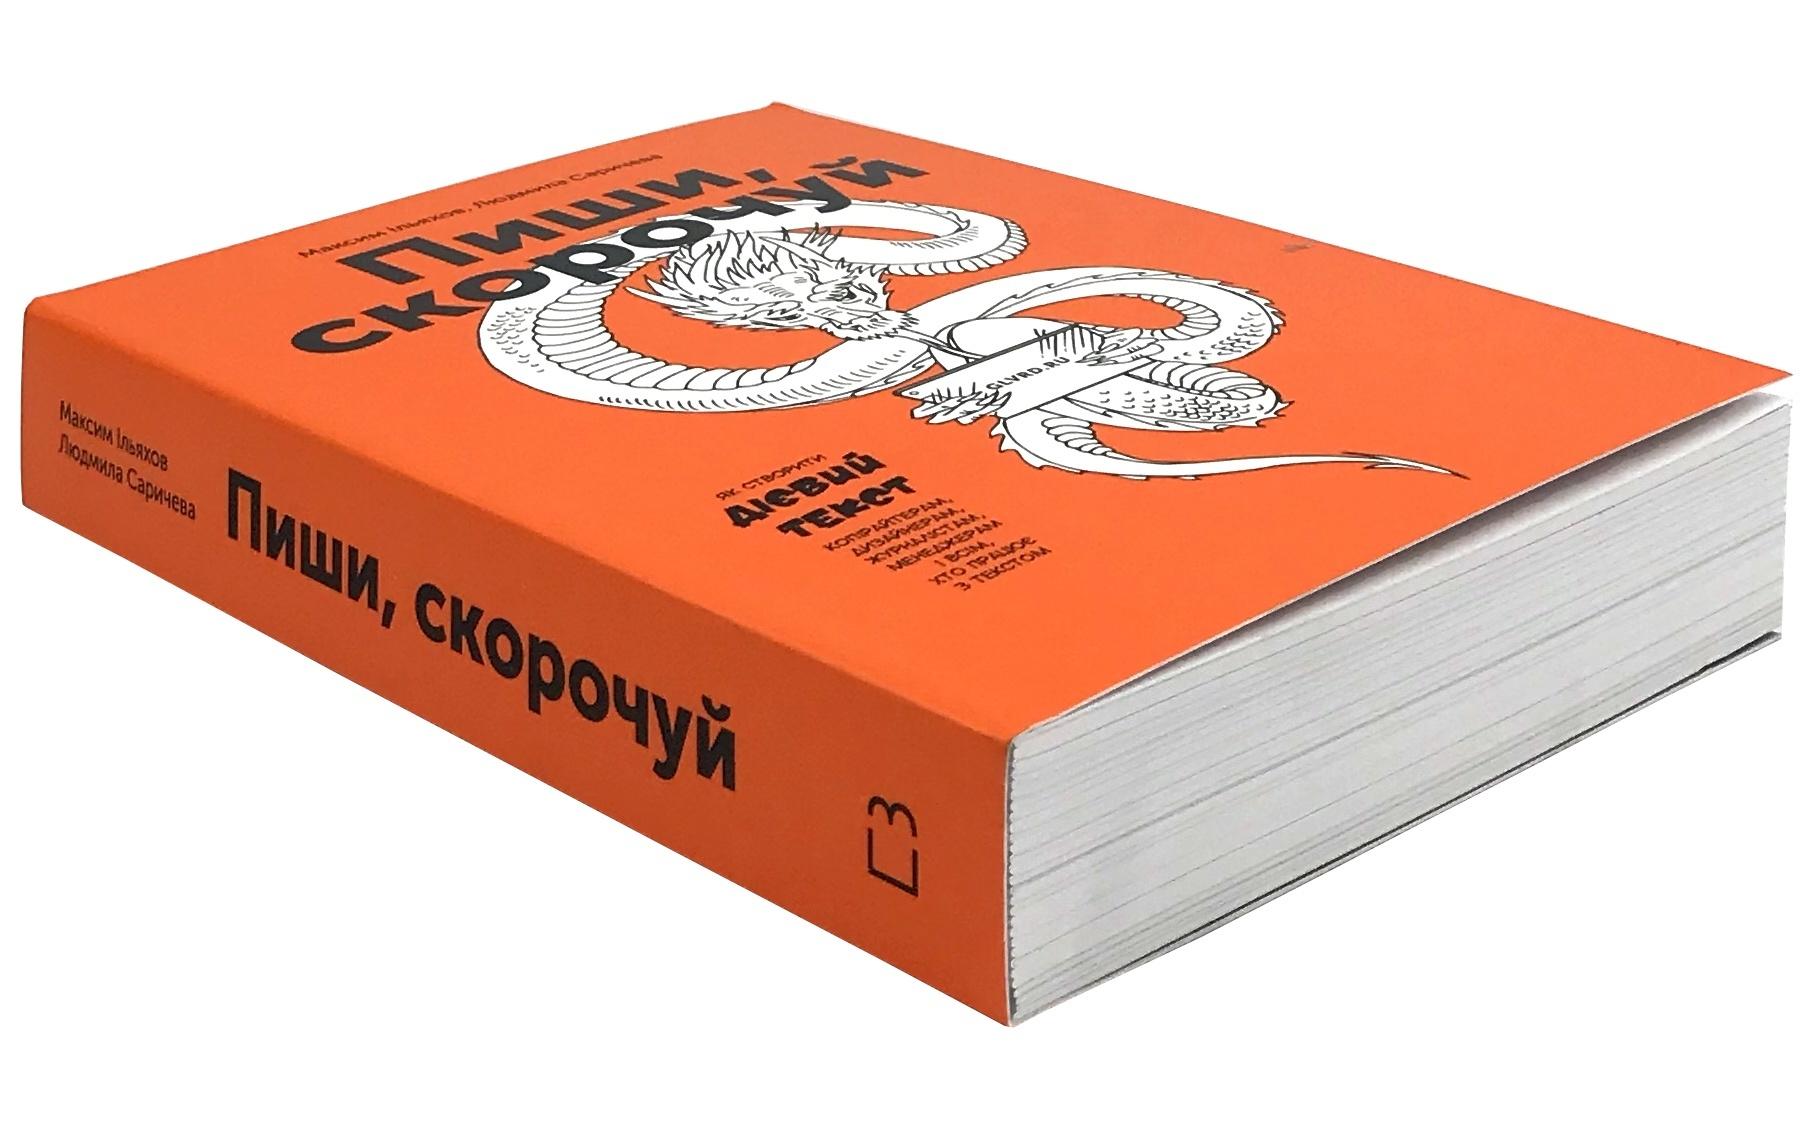 Пиши, скорочуй. Як створити дієвий текст. Автор — Людмила Сарычева, Максим Ильяхов.